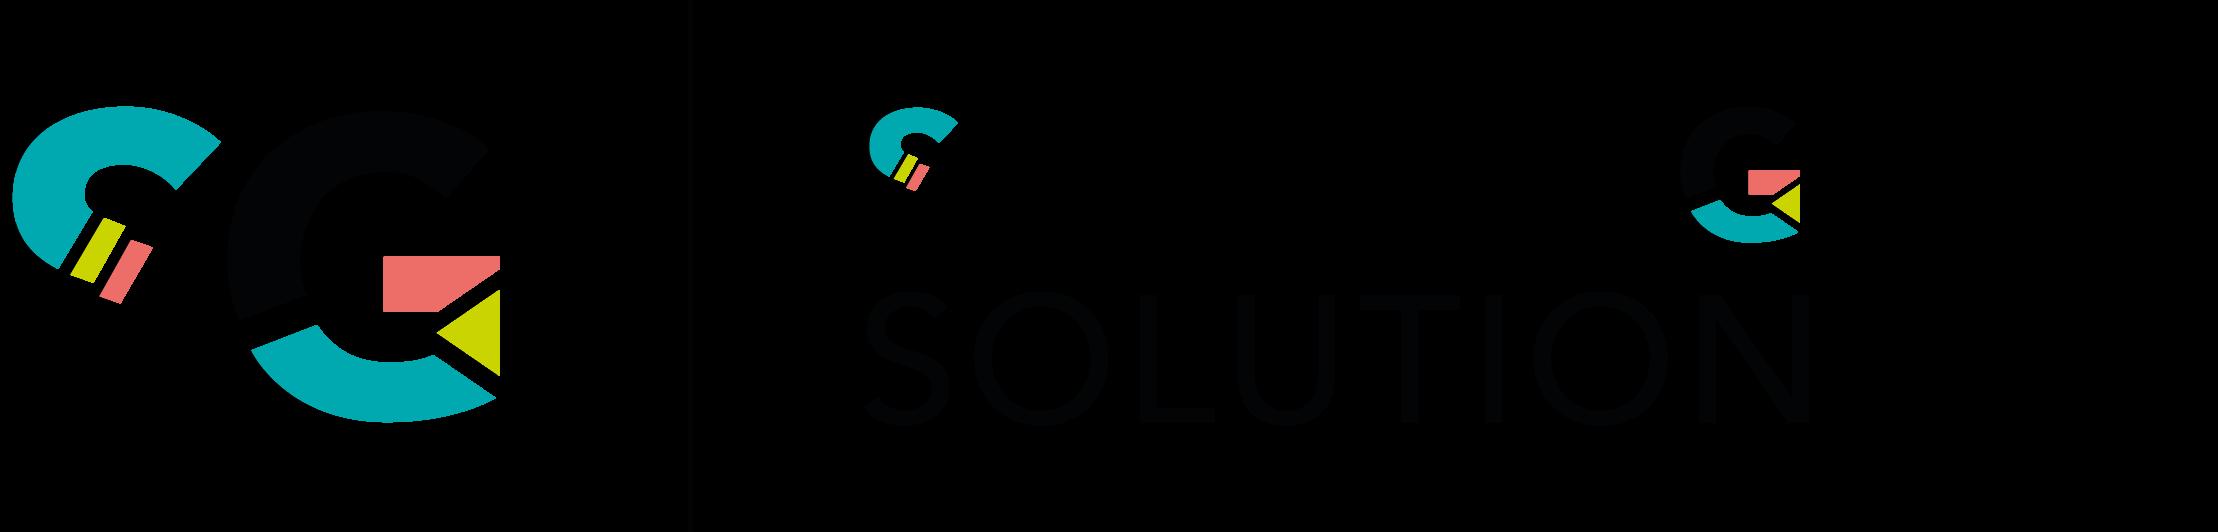 logo Serious Game Solution